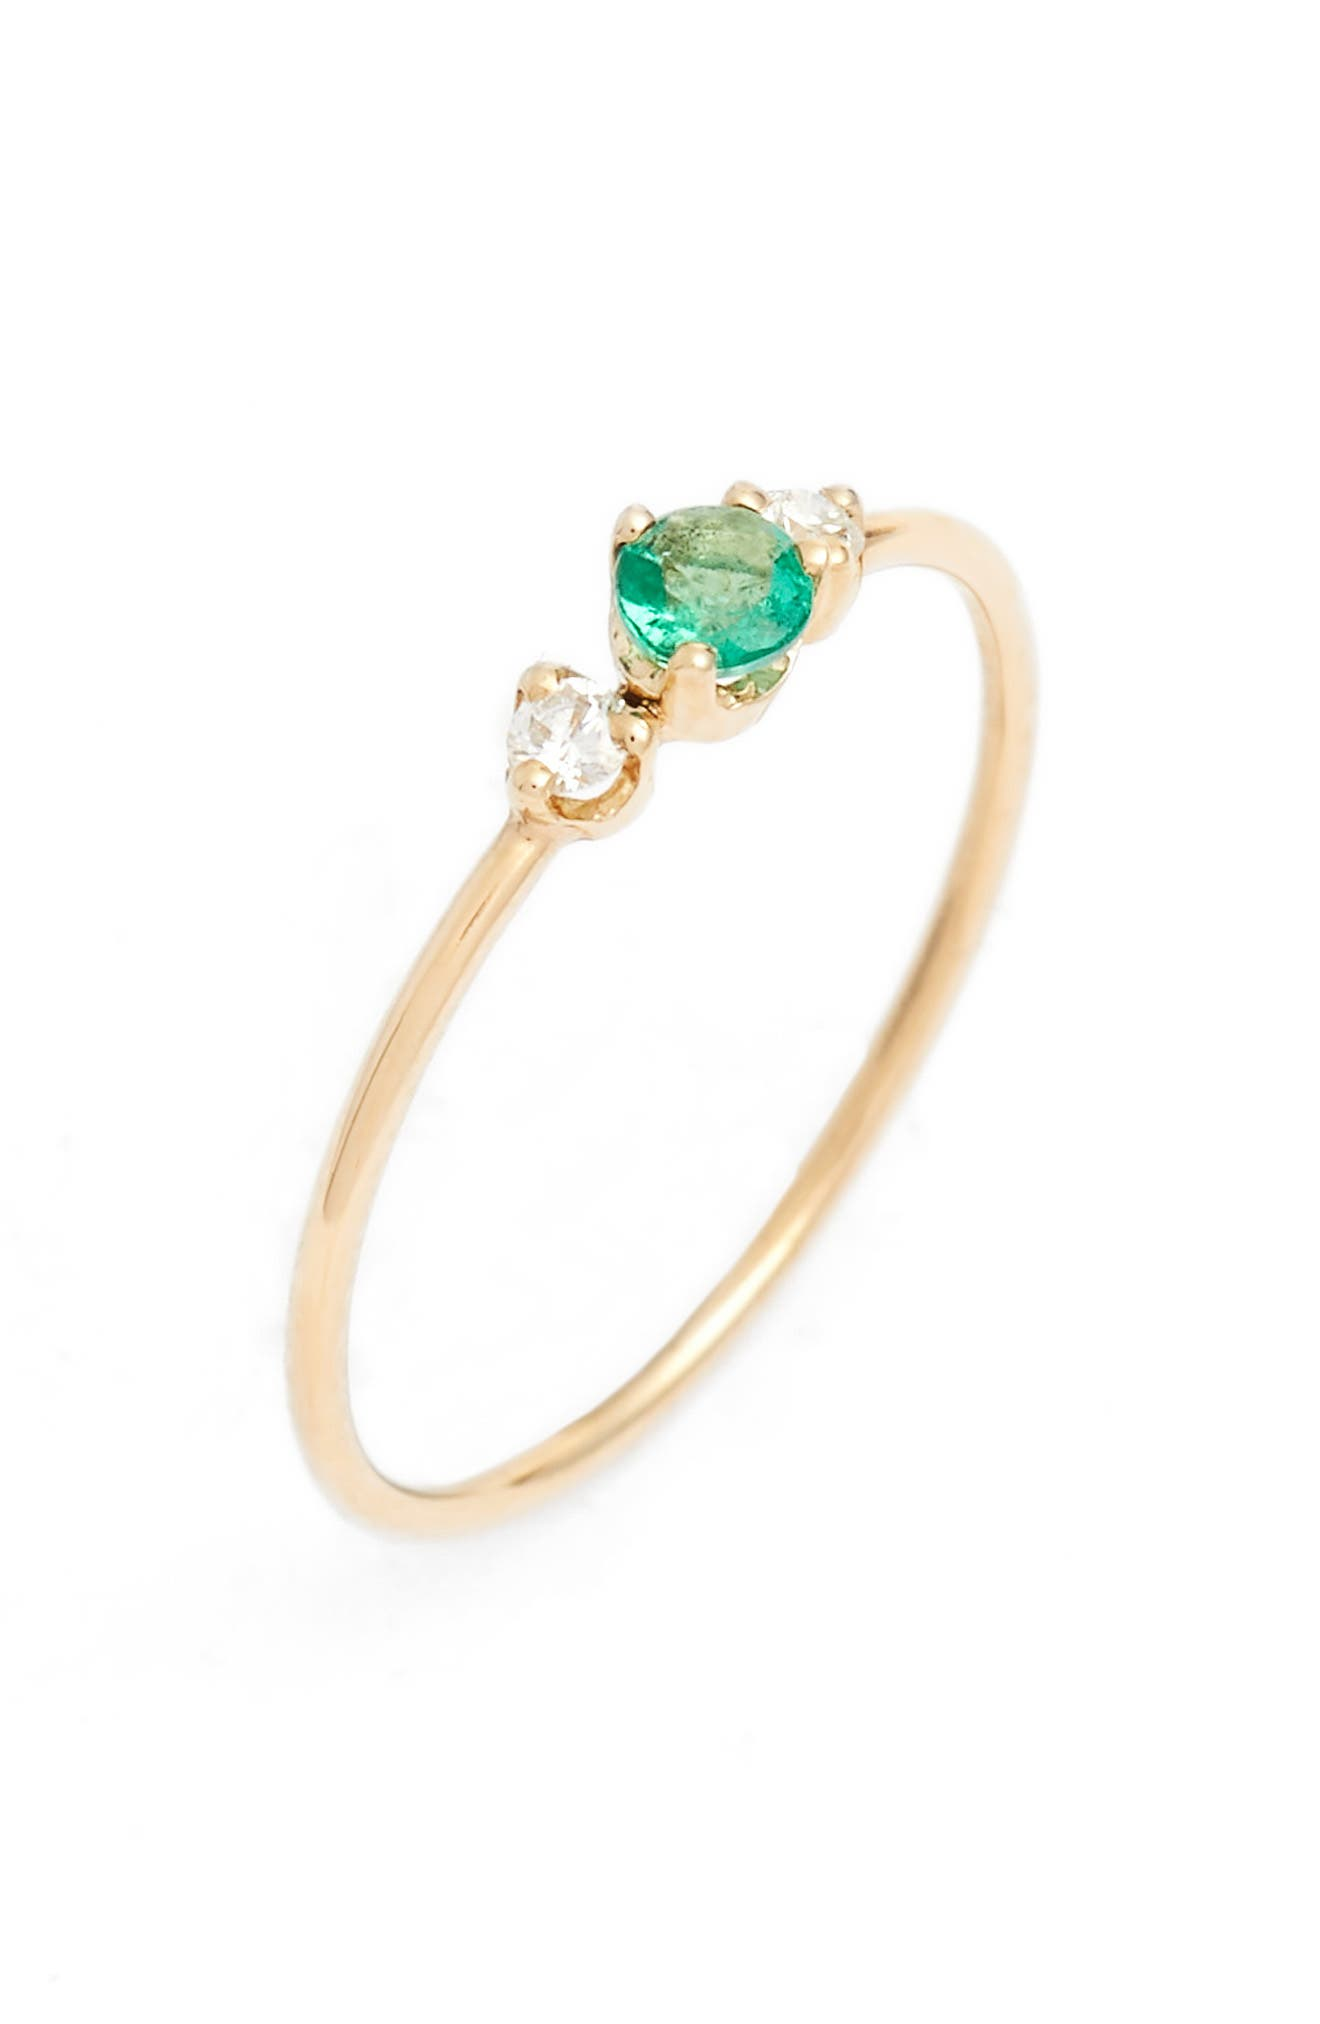 ZOË CHICCO Emerald & Diamond Stack Ring, Main, color, YELLOW GOLD/ EMERALD